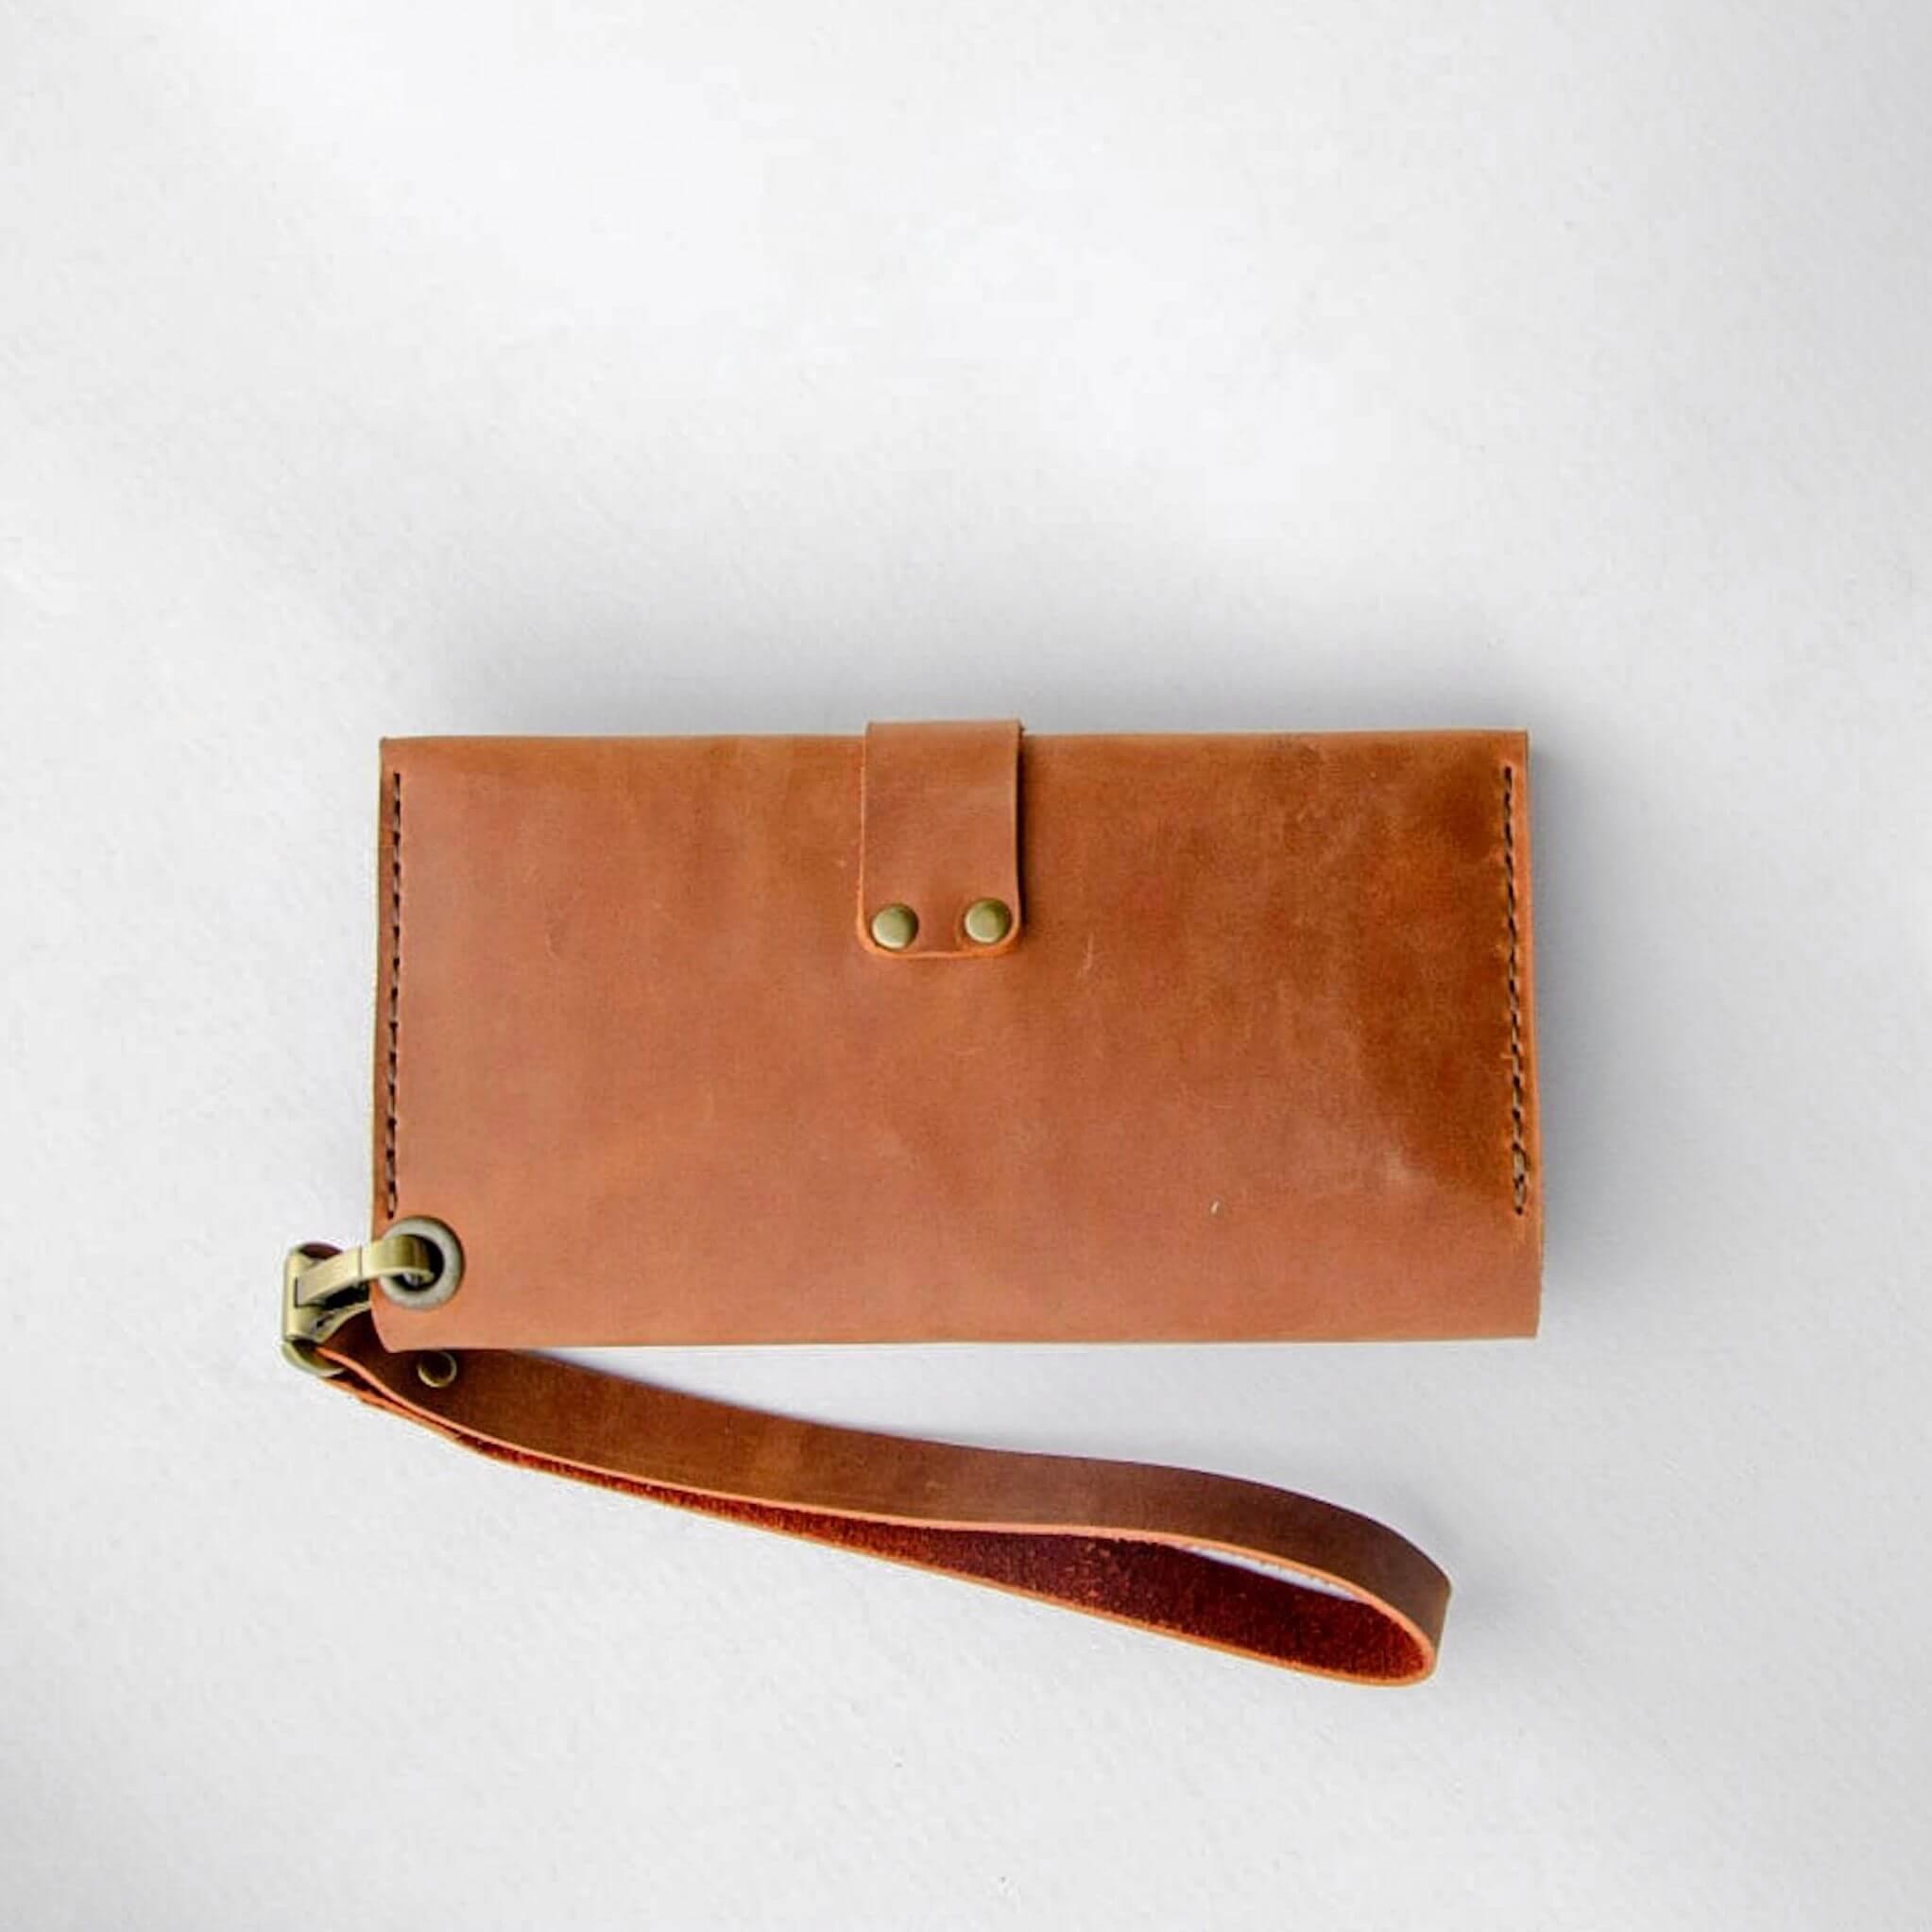 Сognac leather wallet